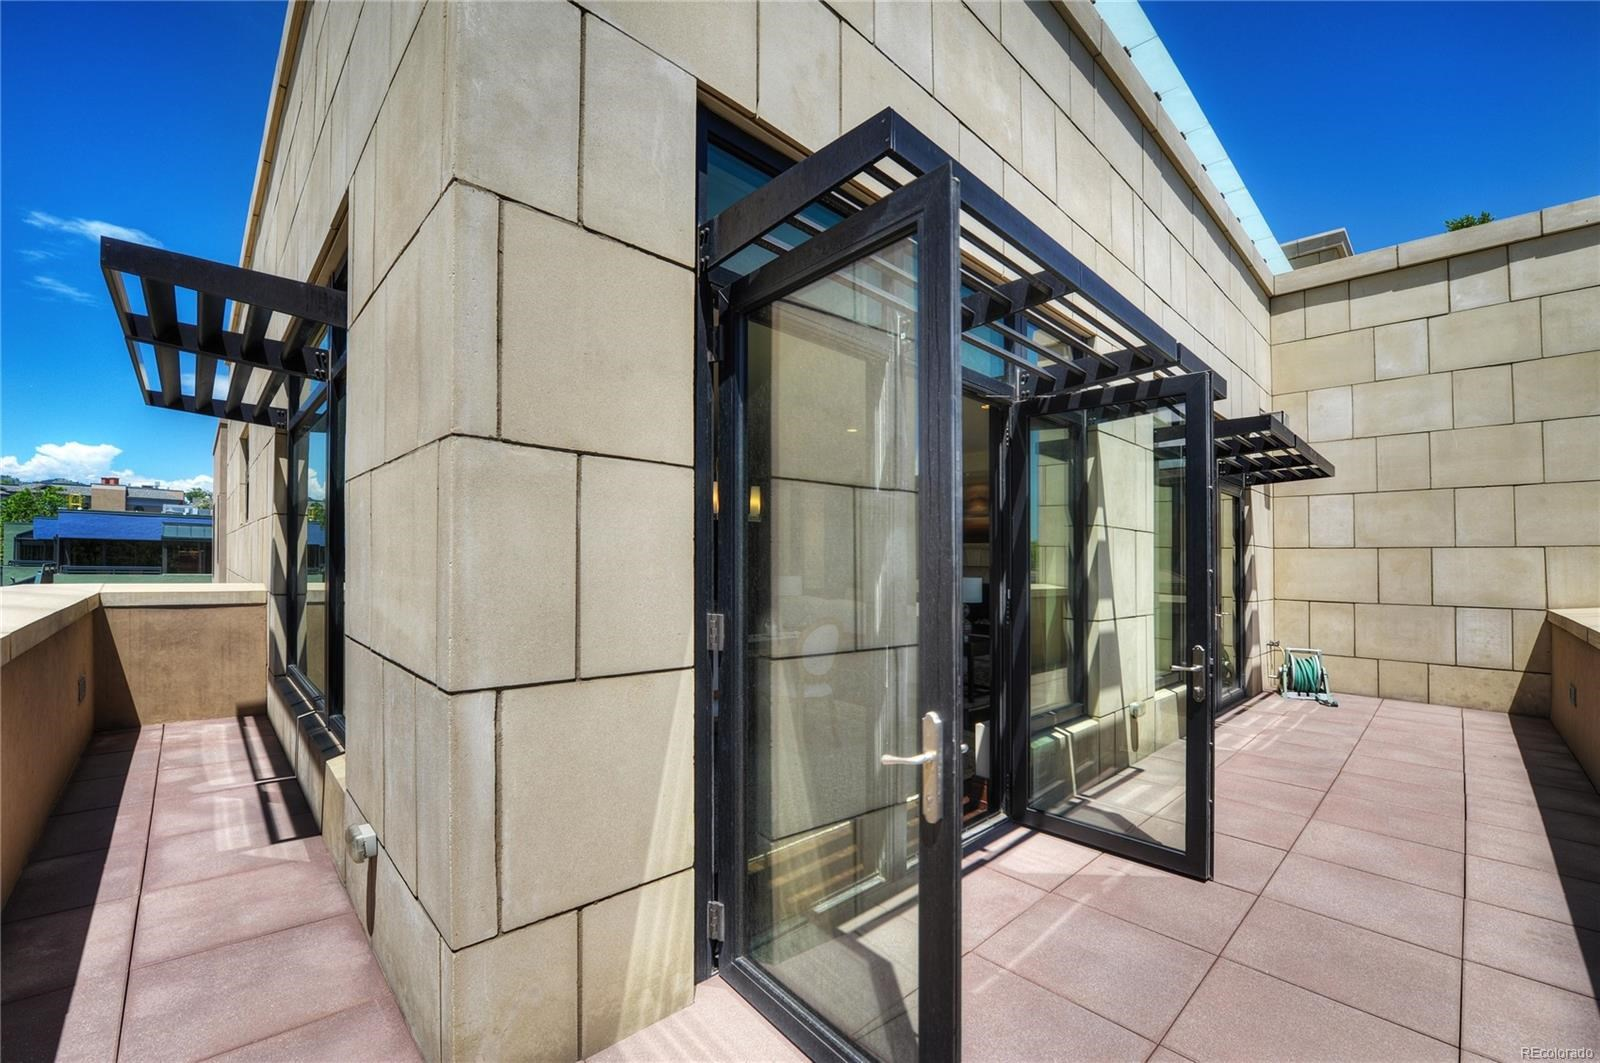 MLS# 8081755 - 5 - 1077 Canyon Boulevard #302, Boulder, CO 80302